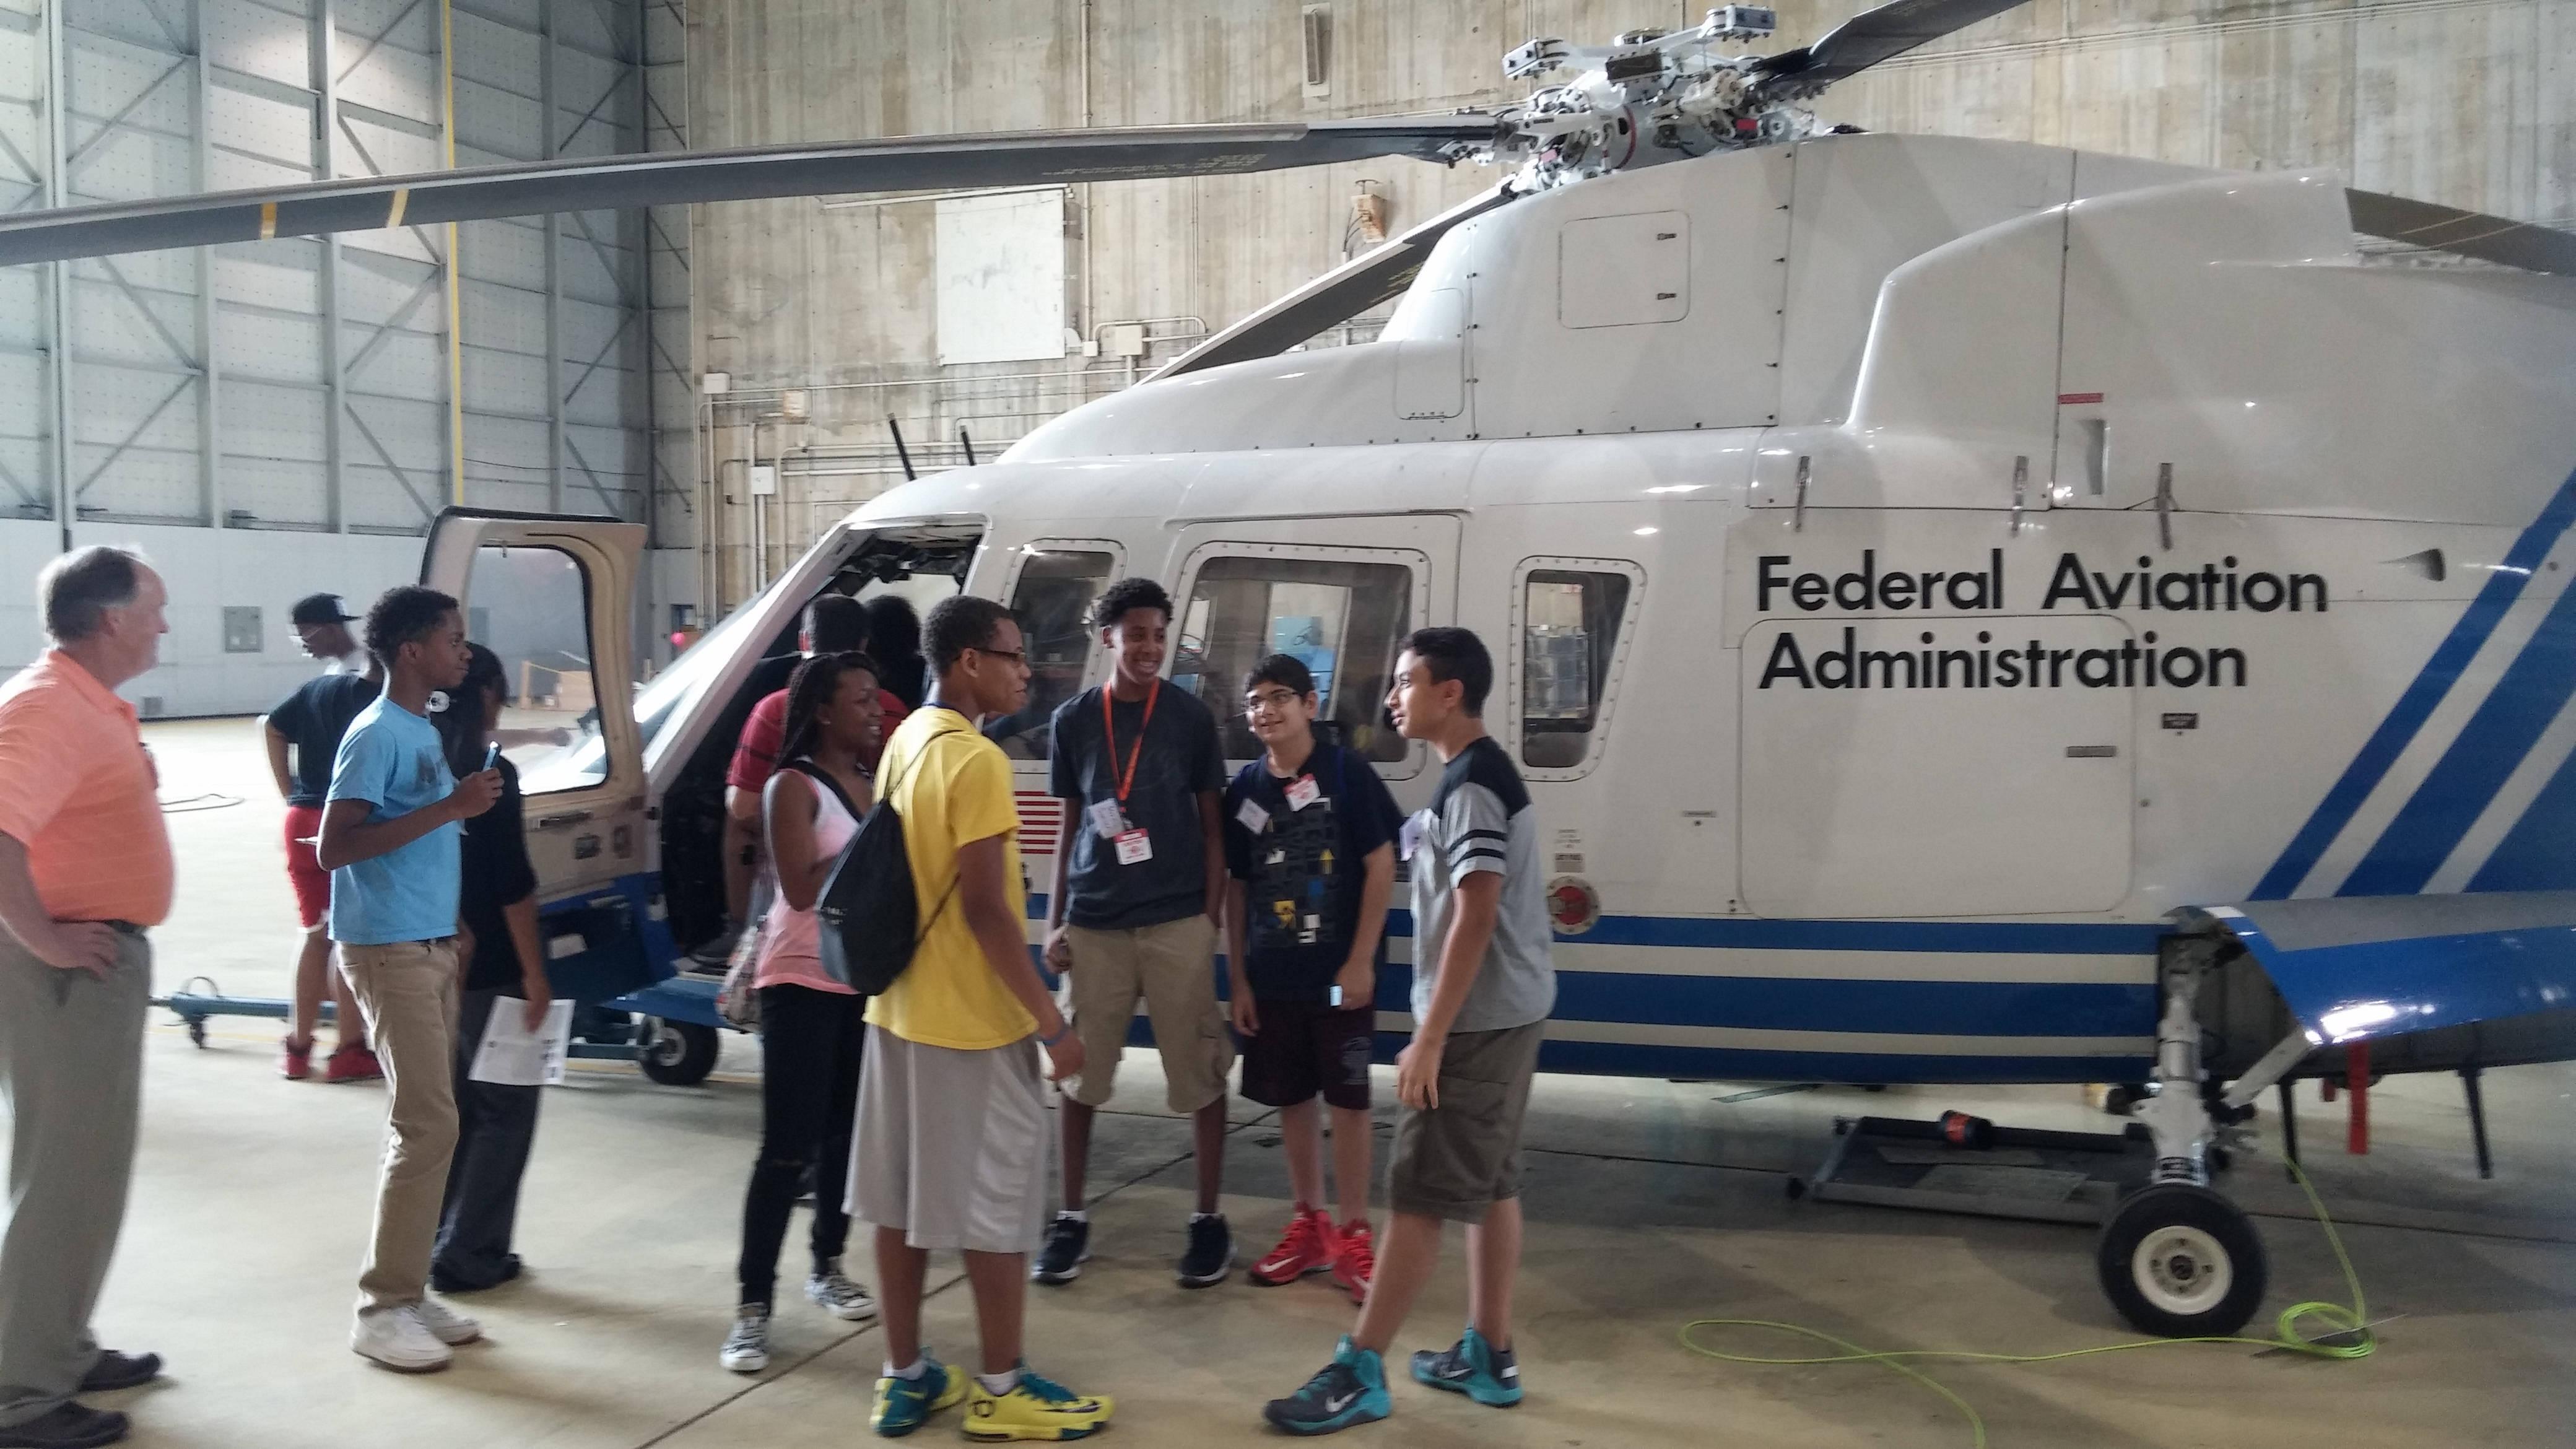 20373a6c3e836470f501_FAA_Tech_Center_Chopper.jpg